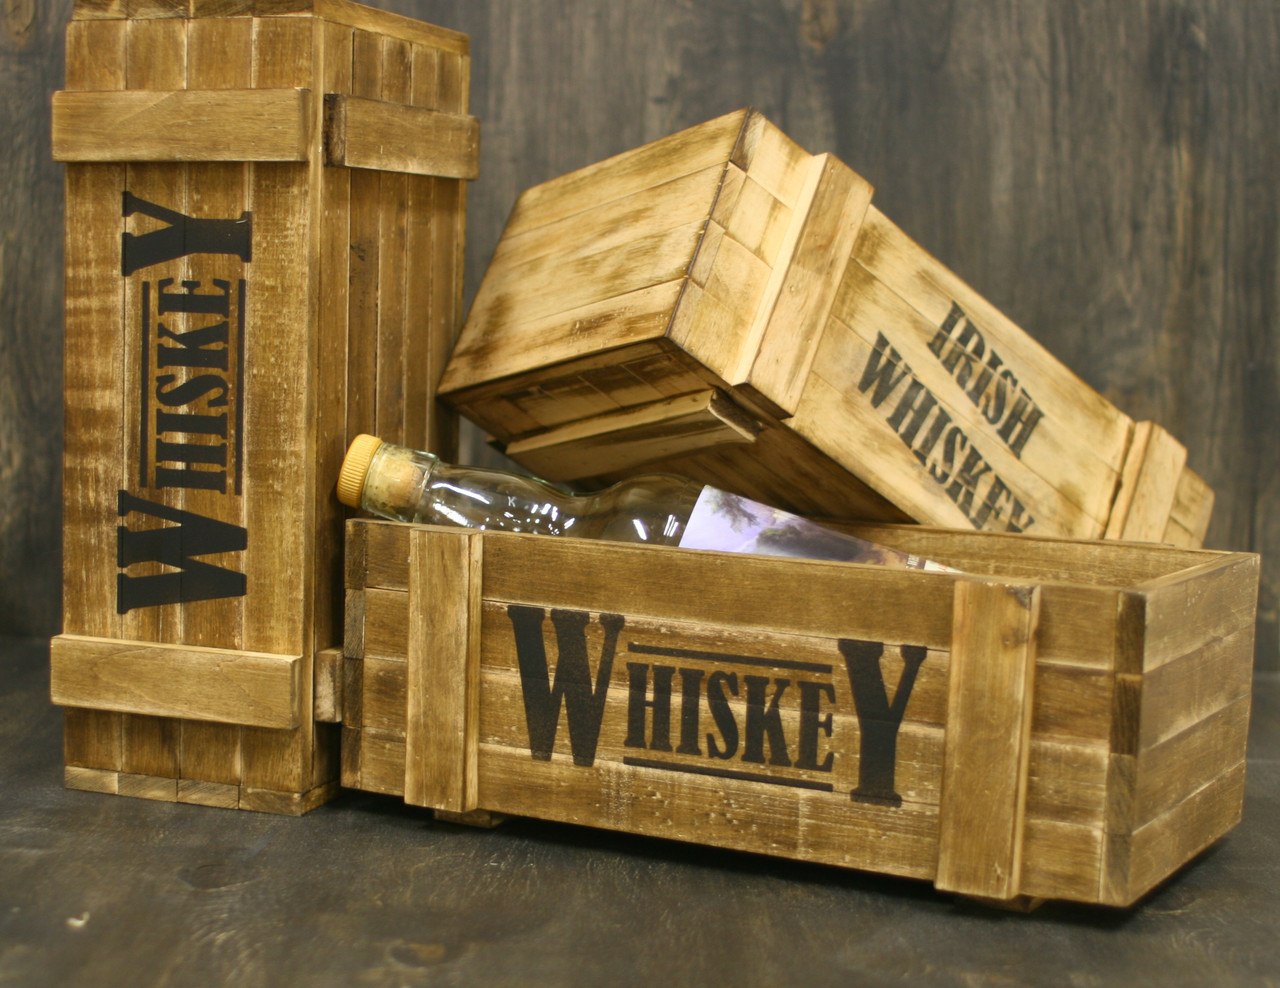 850181315eb64 Деревянный ящик Whiskey, цена 320 грн., купить в Киеве — Prom.ua (ID ...